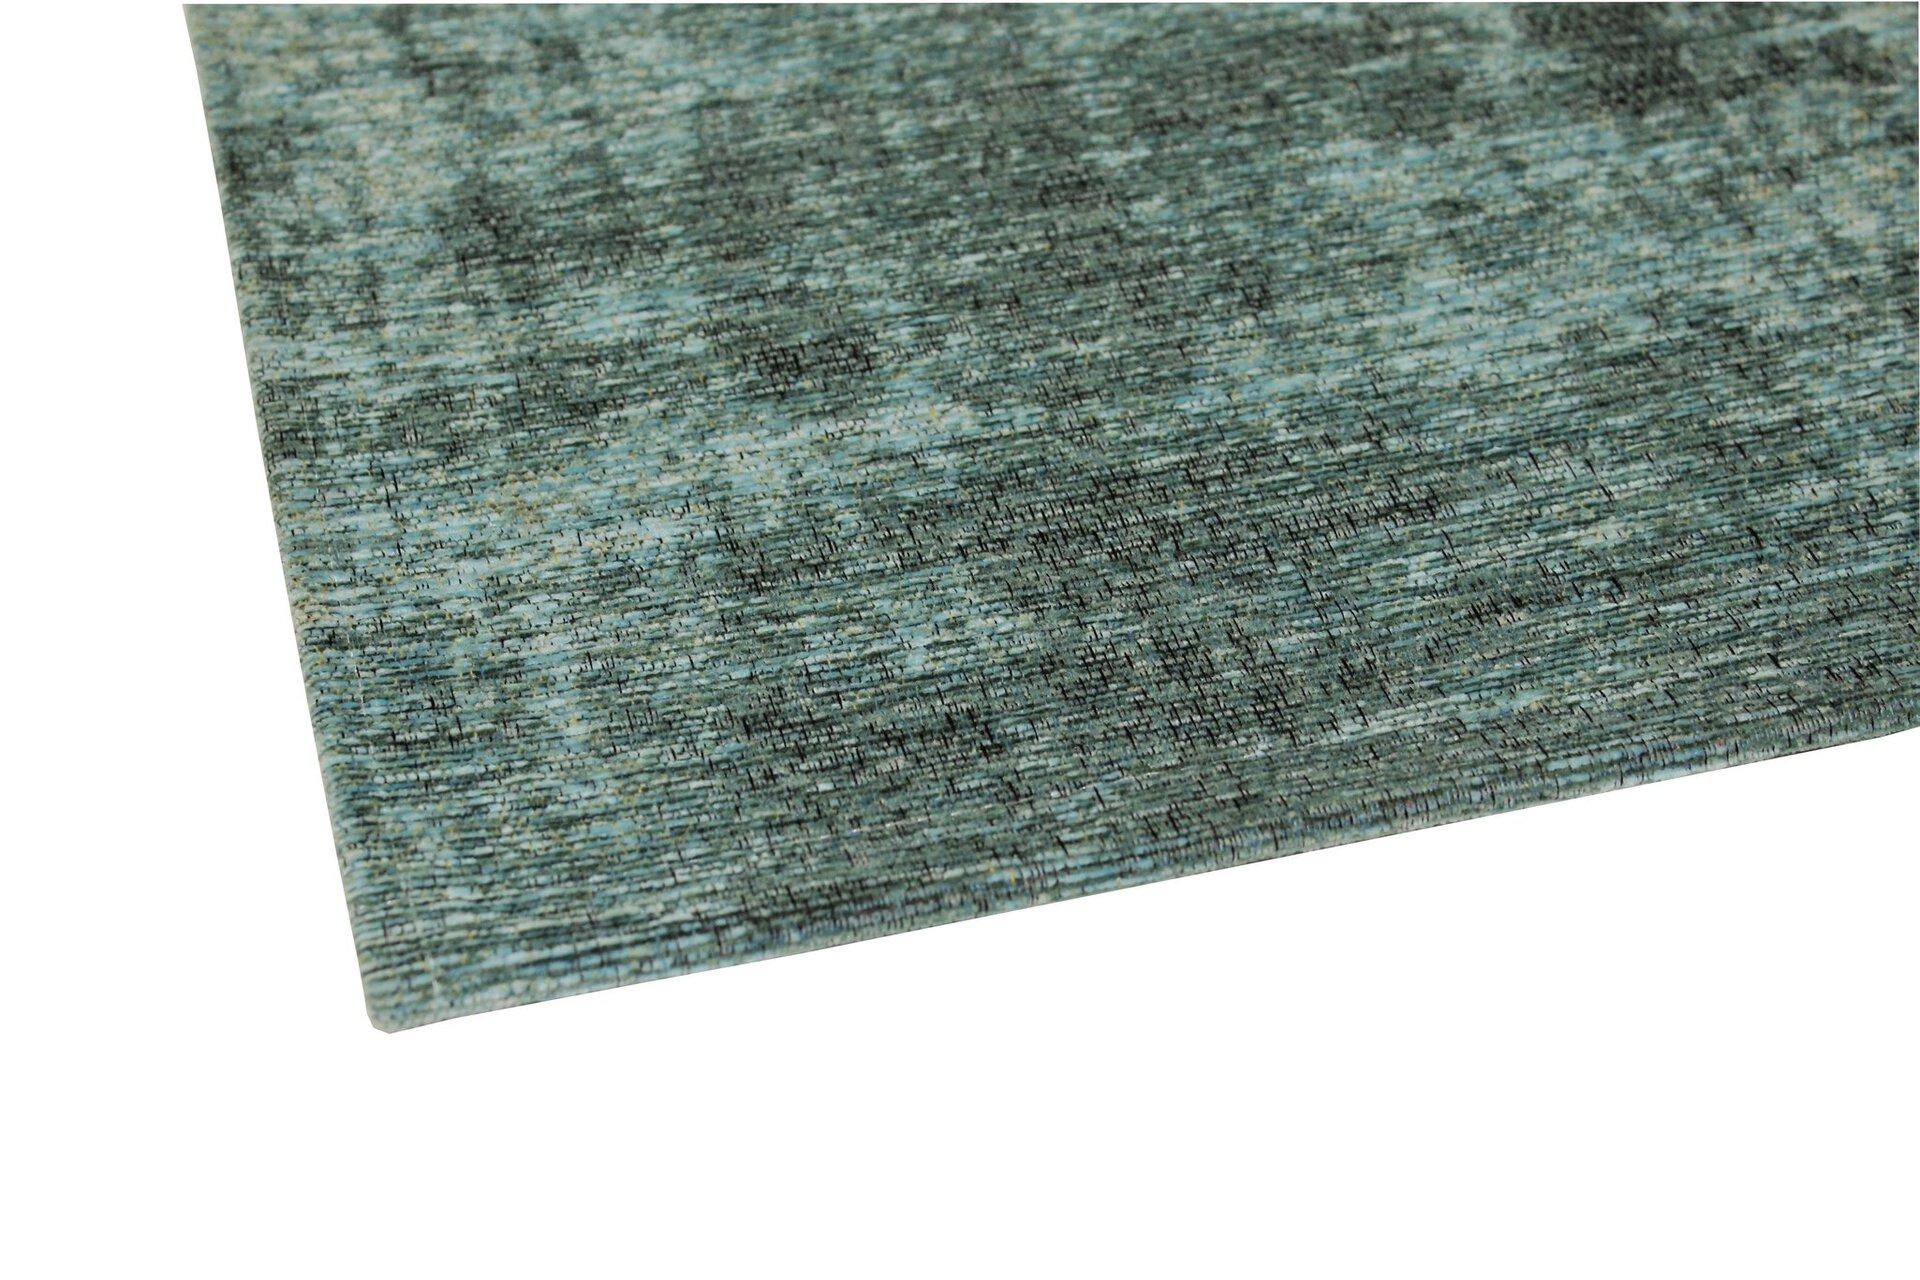 Maschinenwebteppich Saragoza DEKOWE Textil Blau 130 x 190 cm